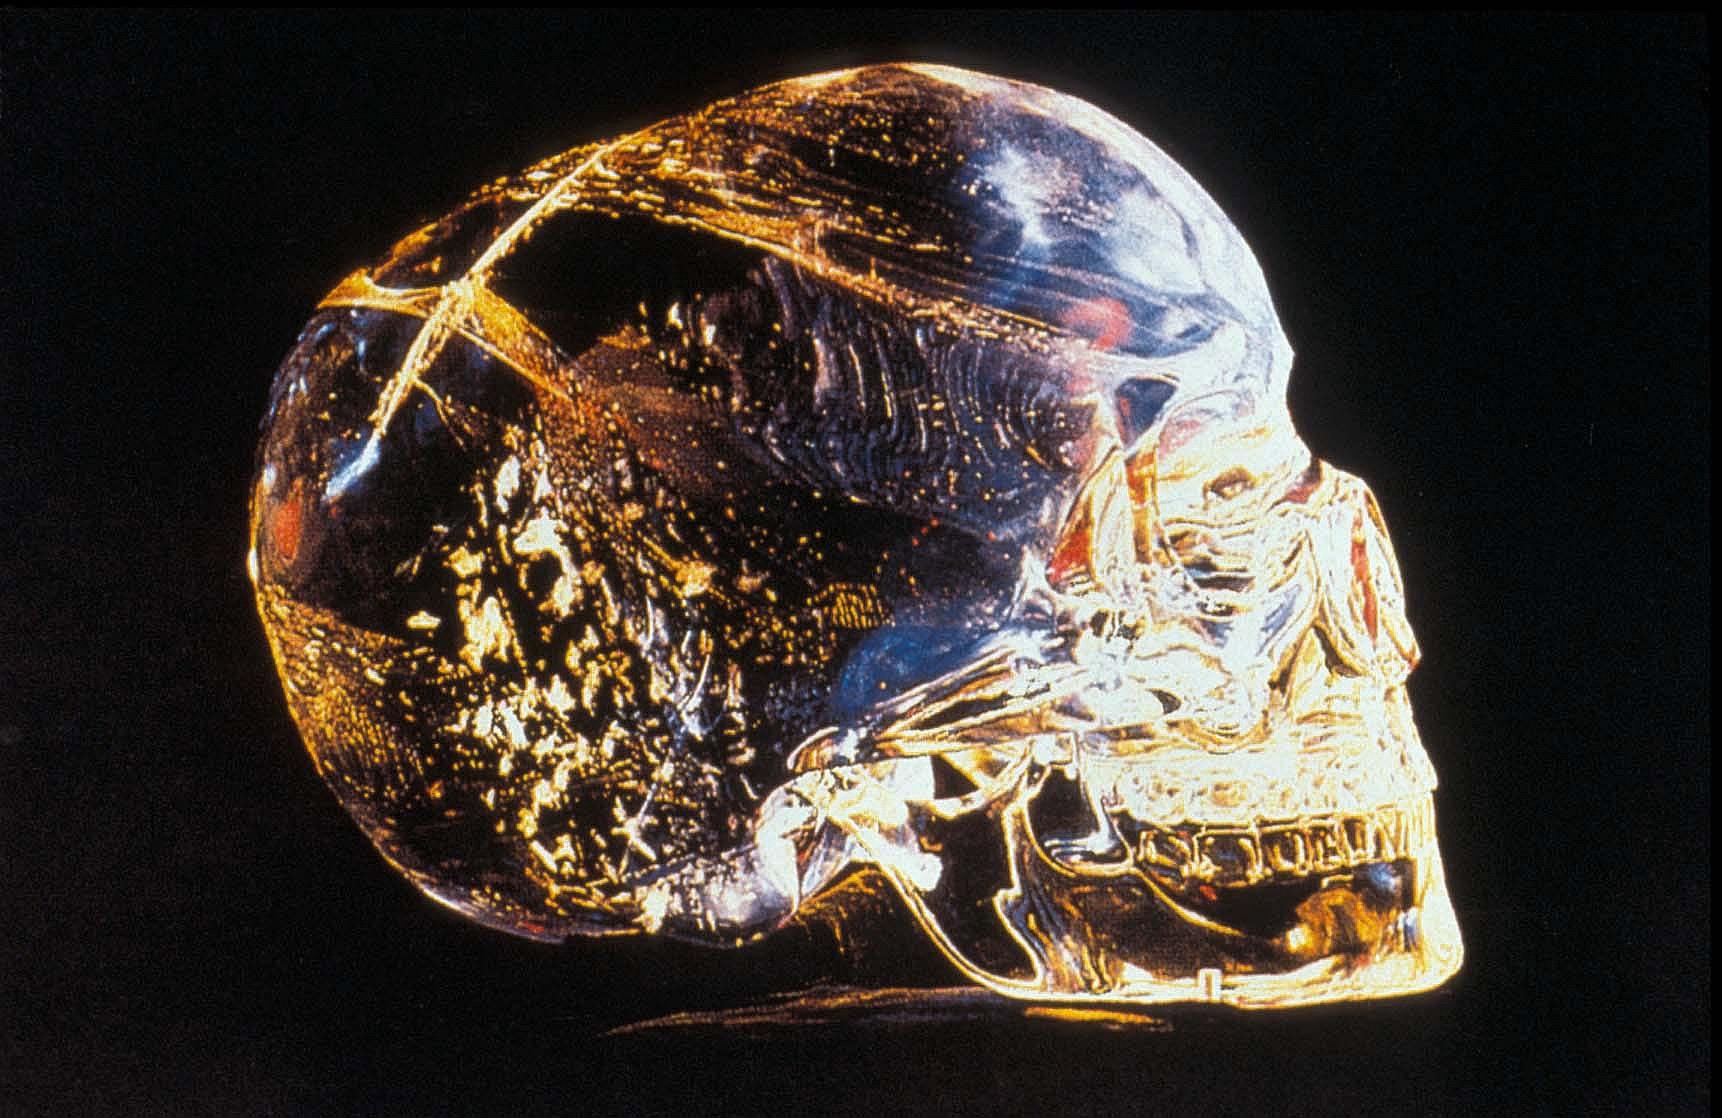 calavera muerte cristal cuarzo